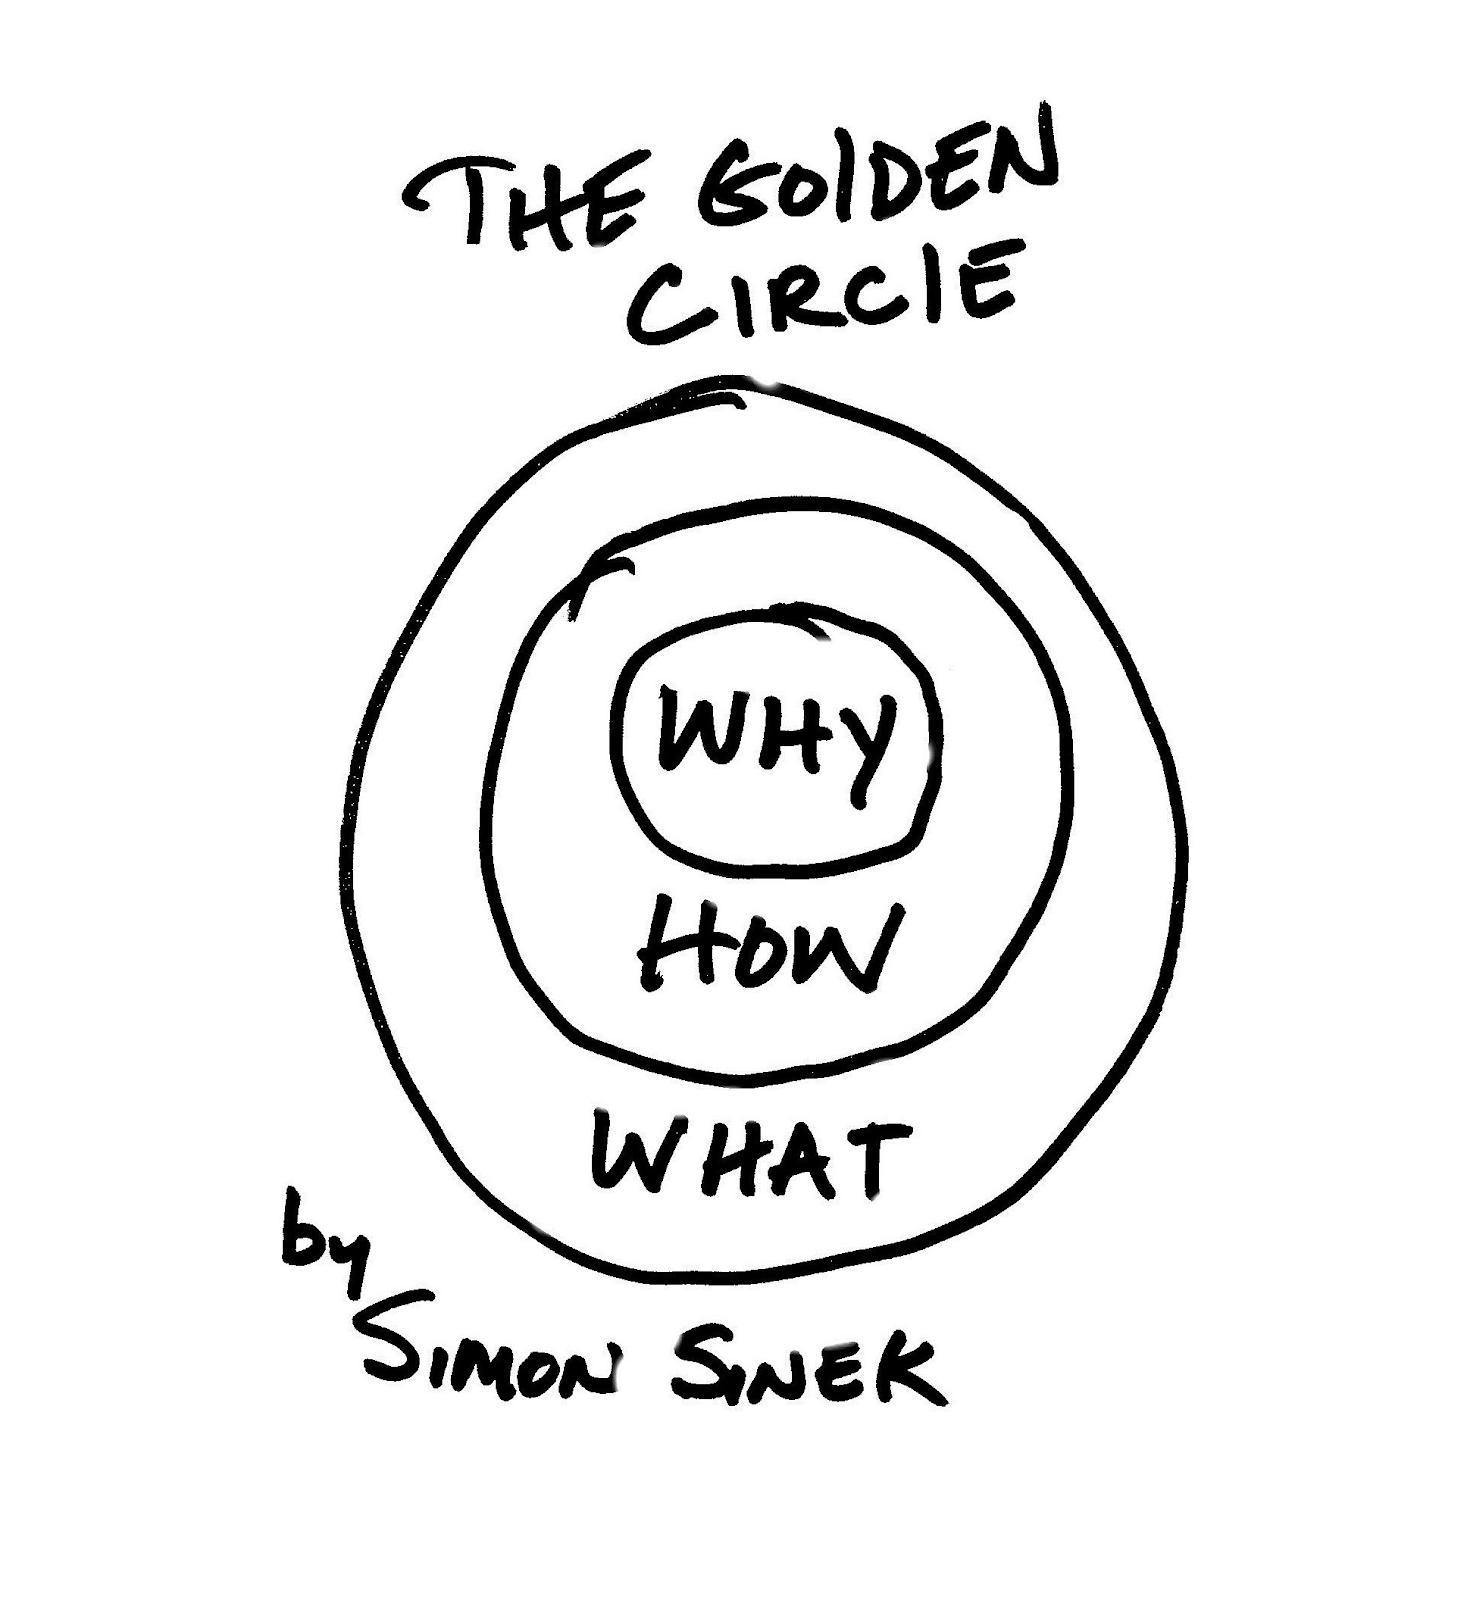 Golden Circle méthode WHY